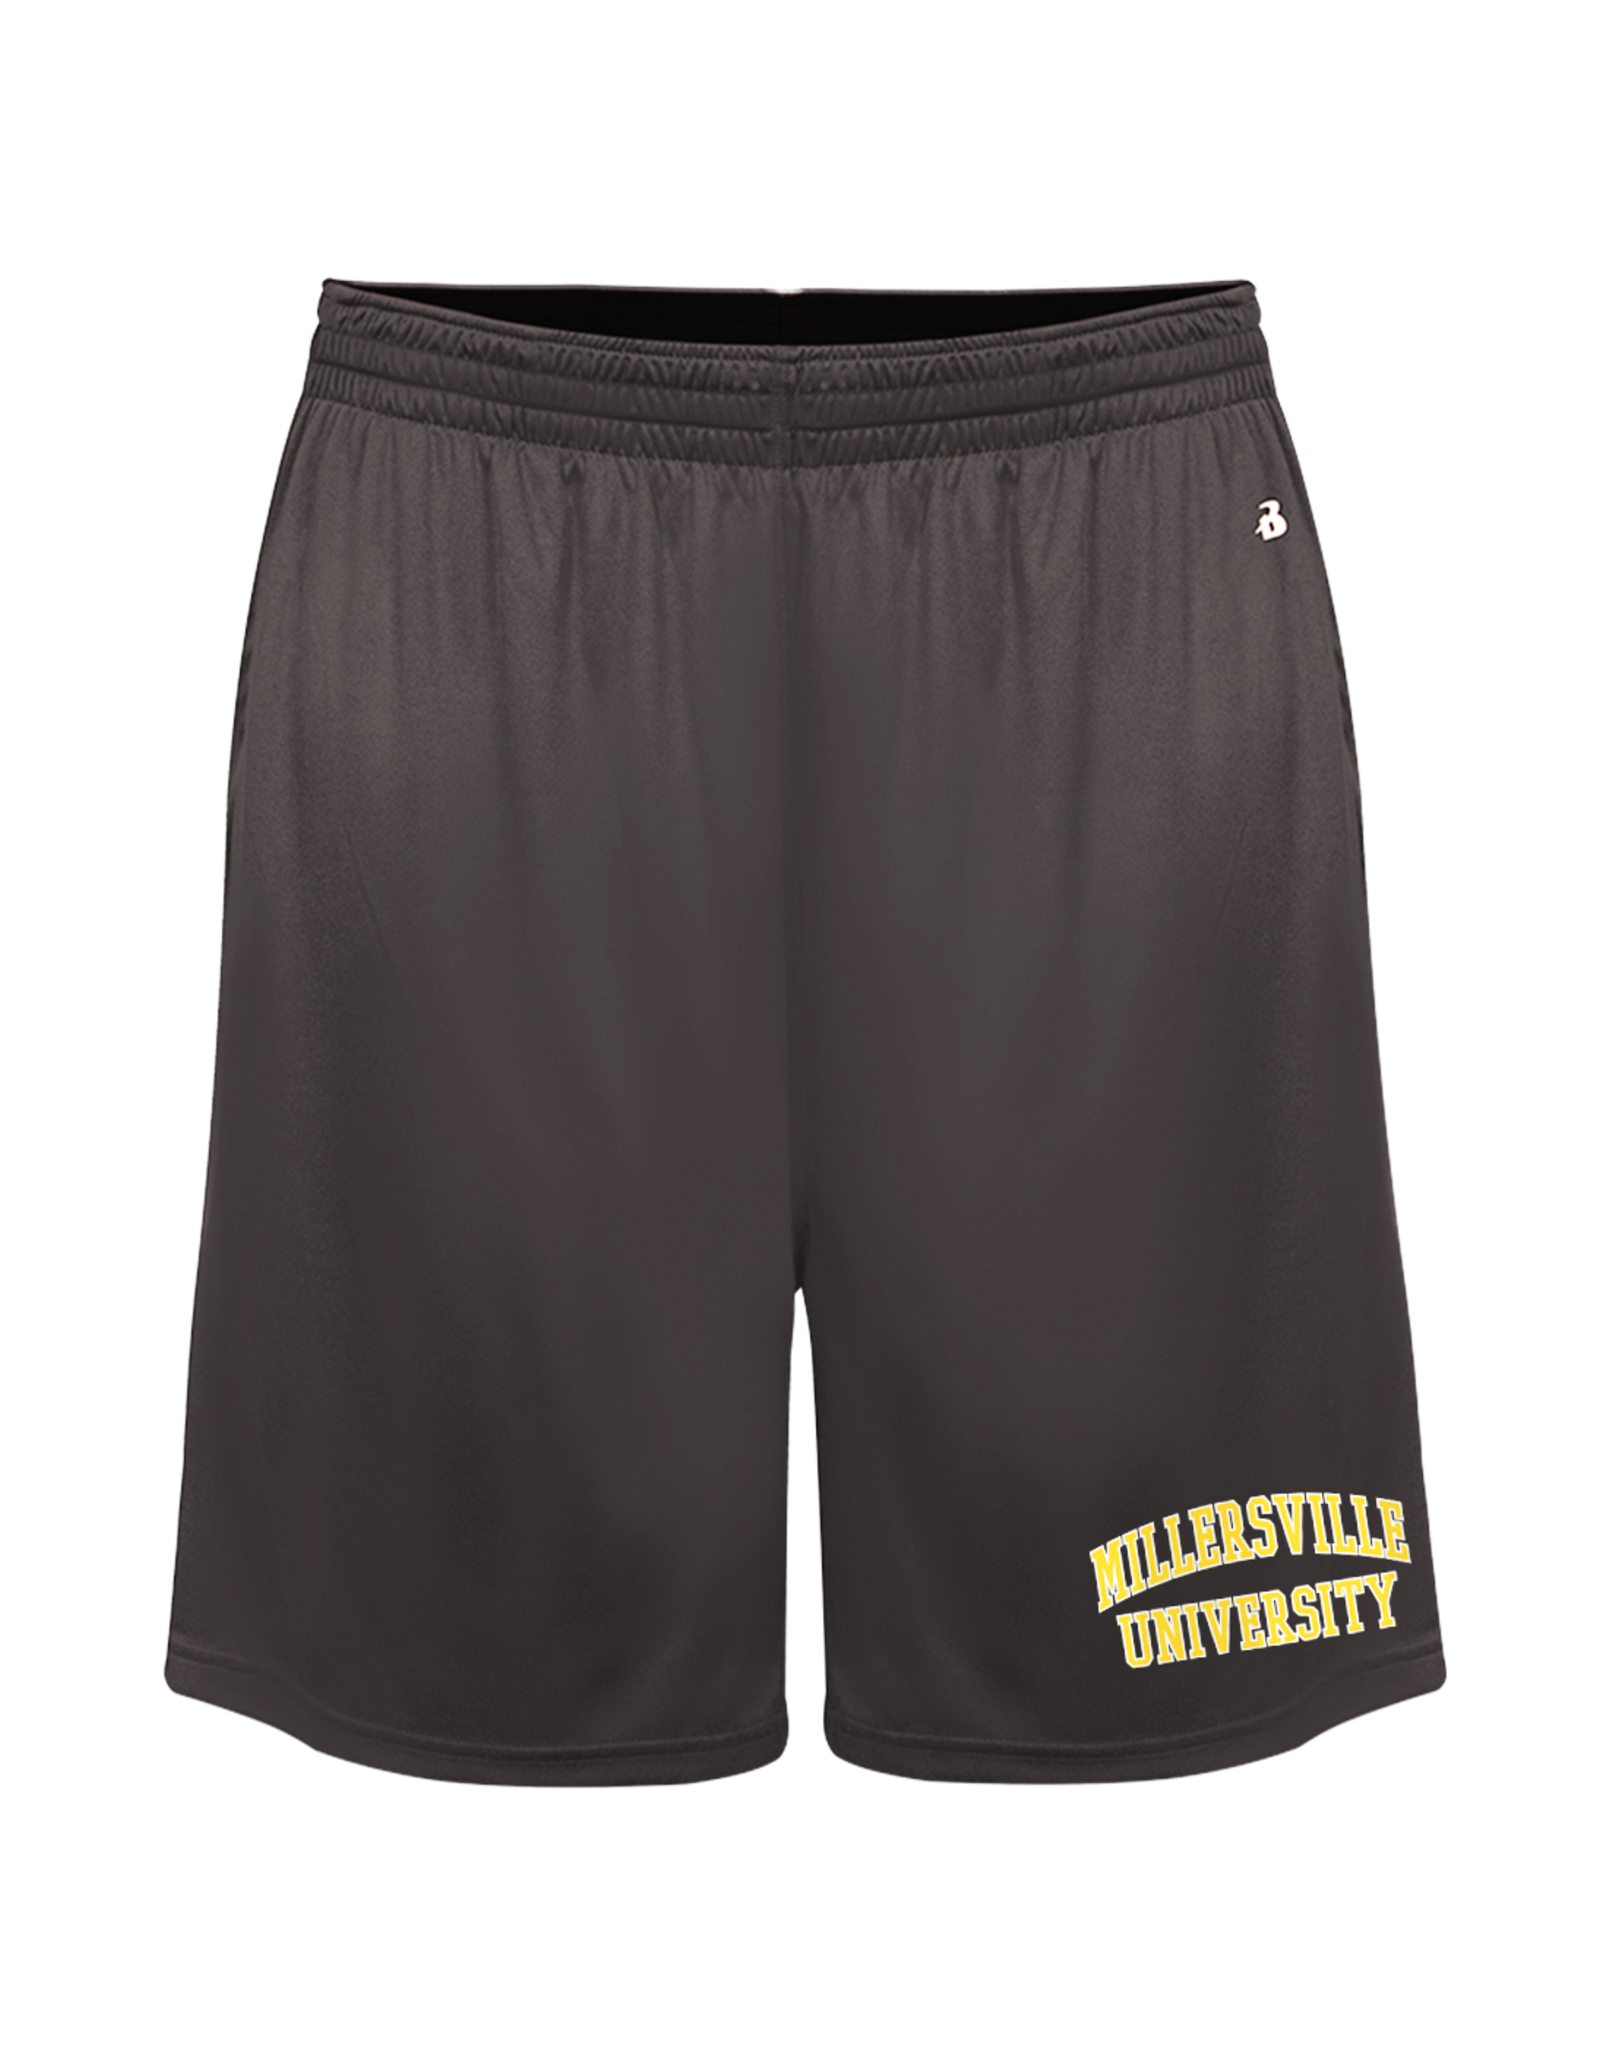 Ultimate Softlock Shorts